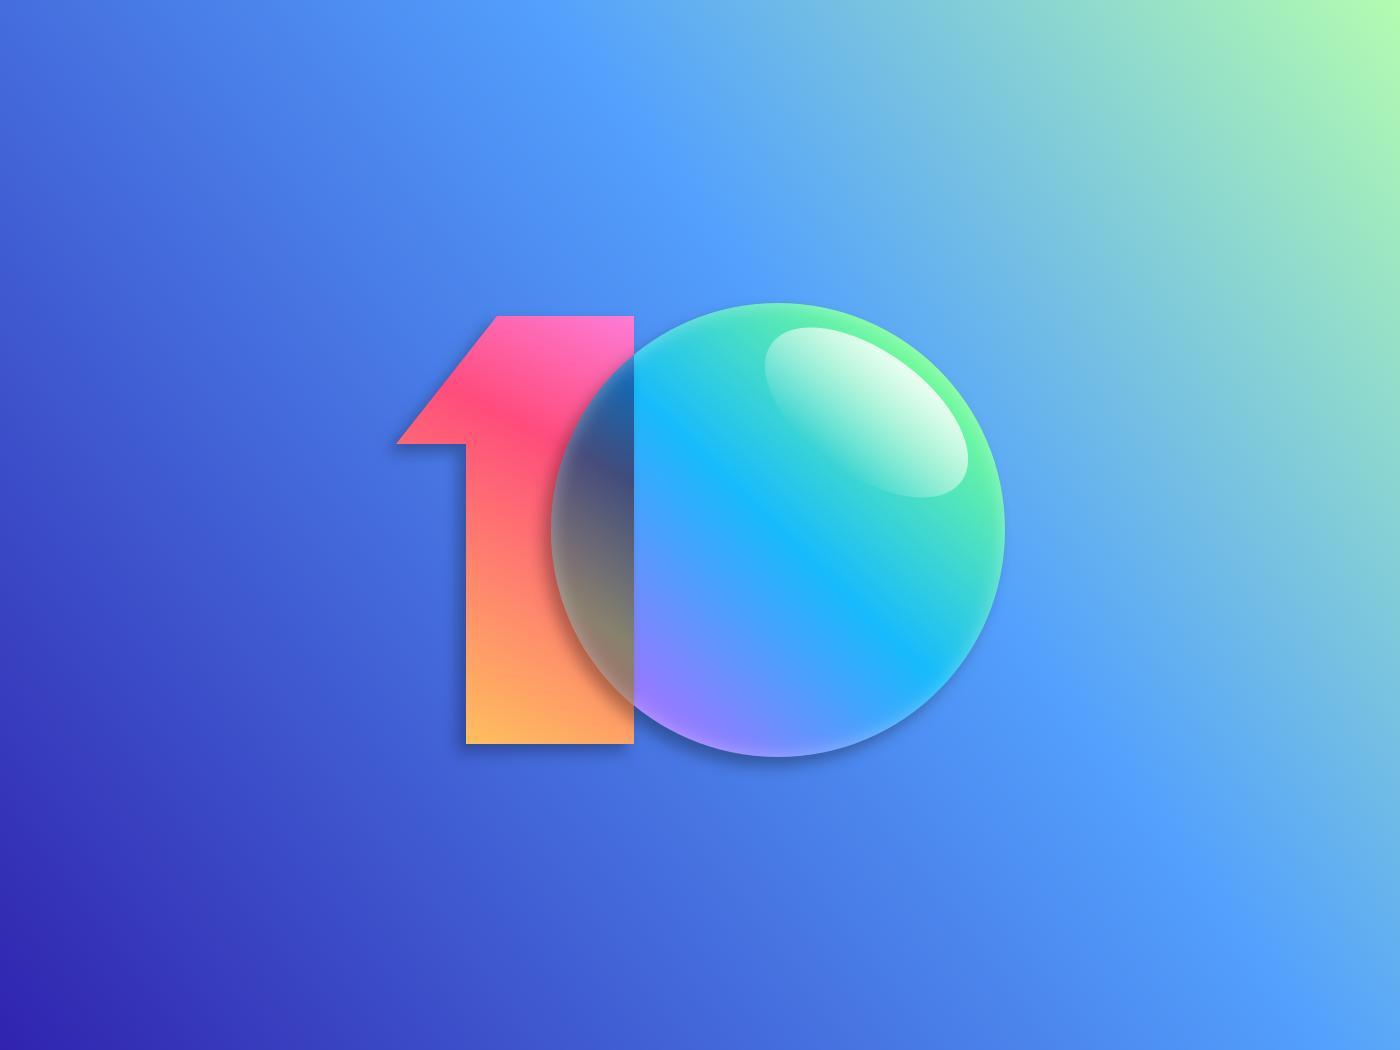 Прошивка MIUI 10 Global Beta ROM 9.5.9 доступна для ряда устройств Xioami